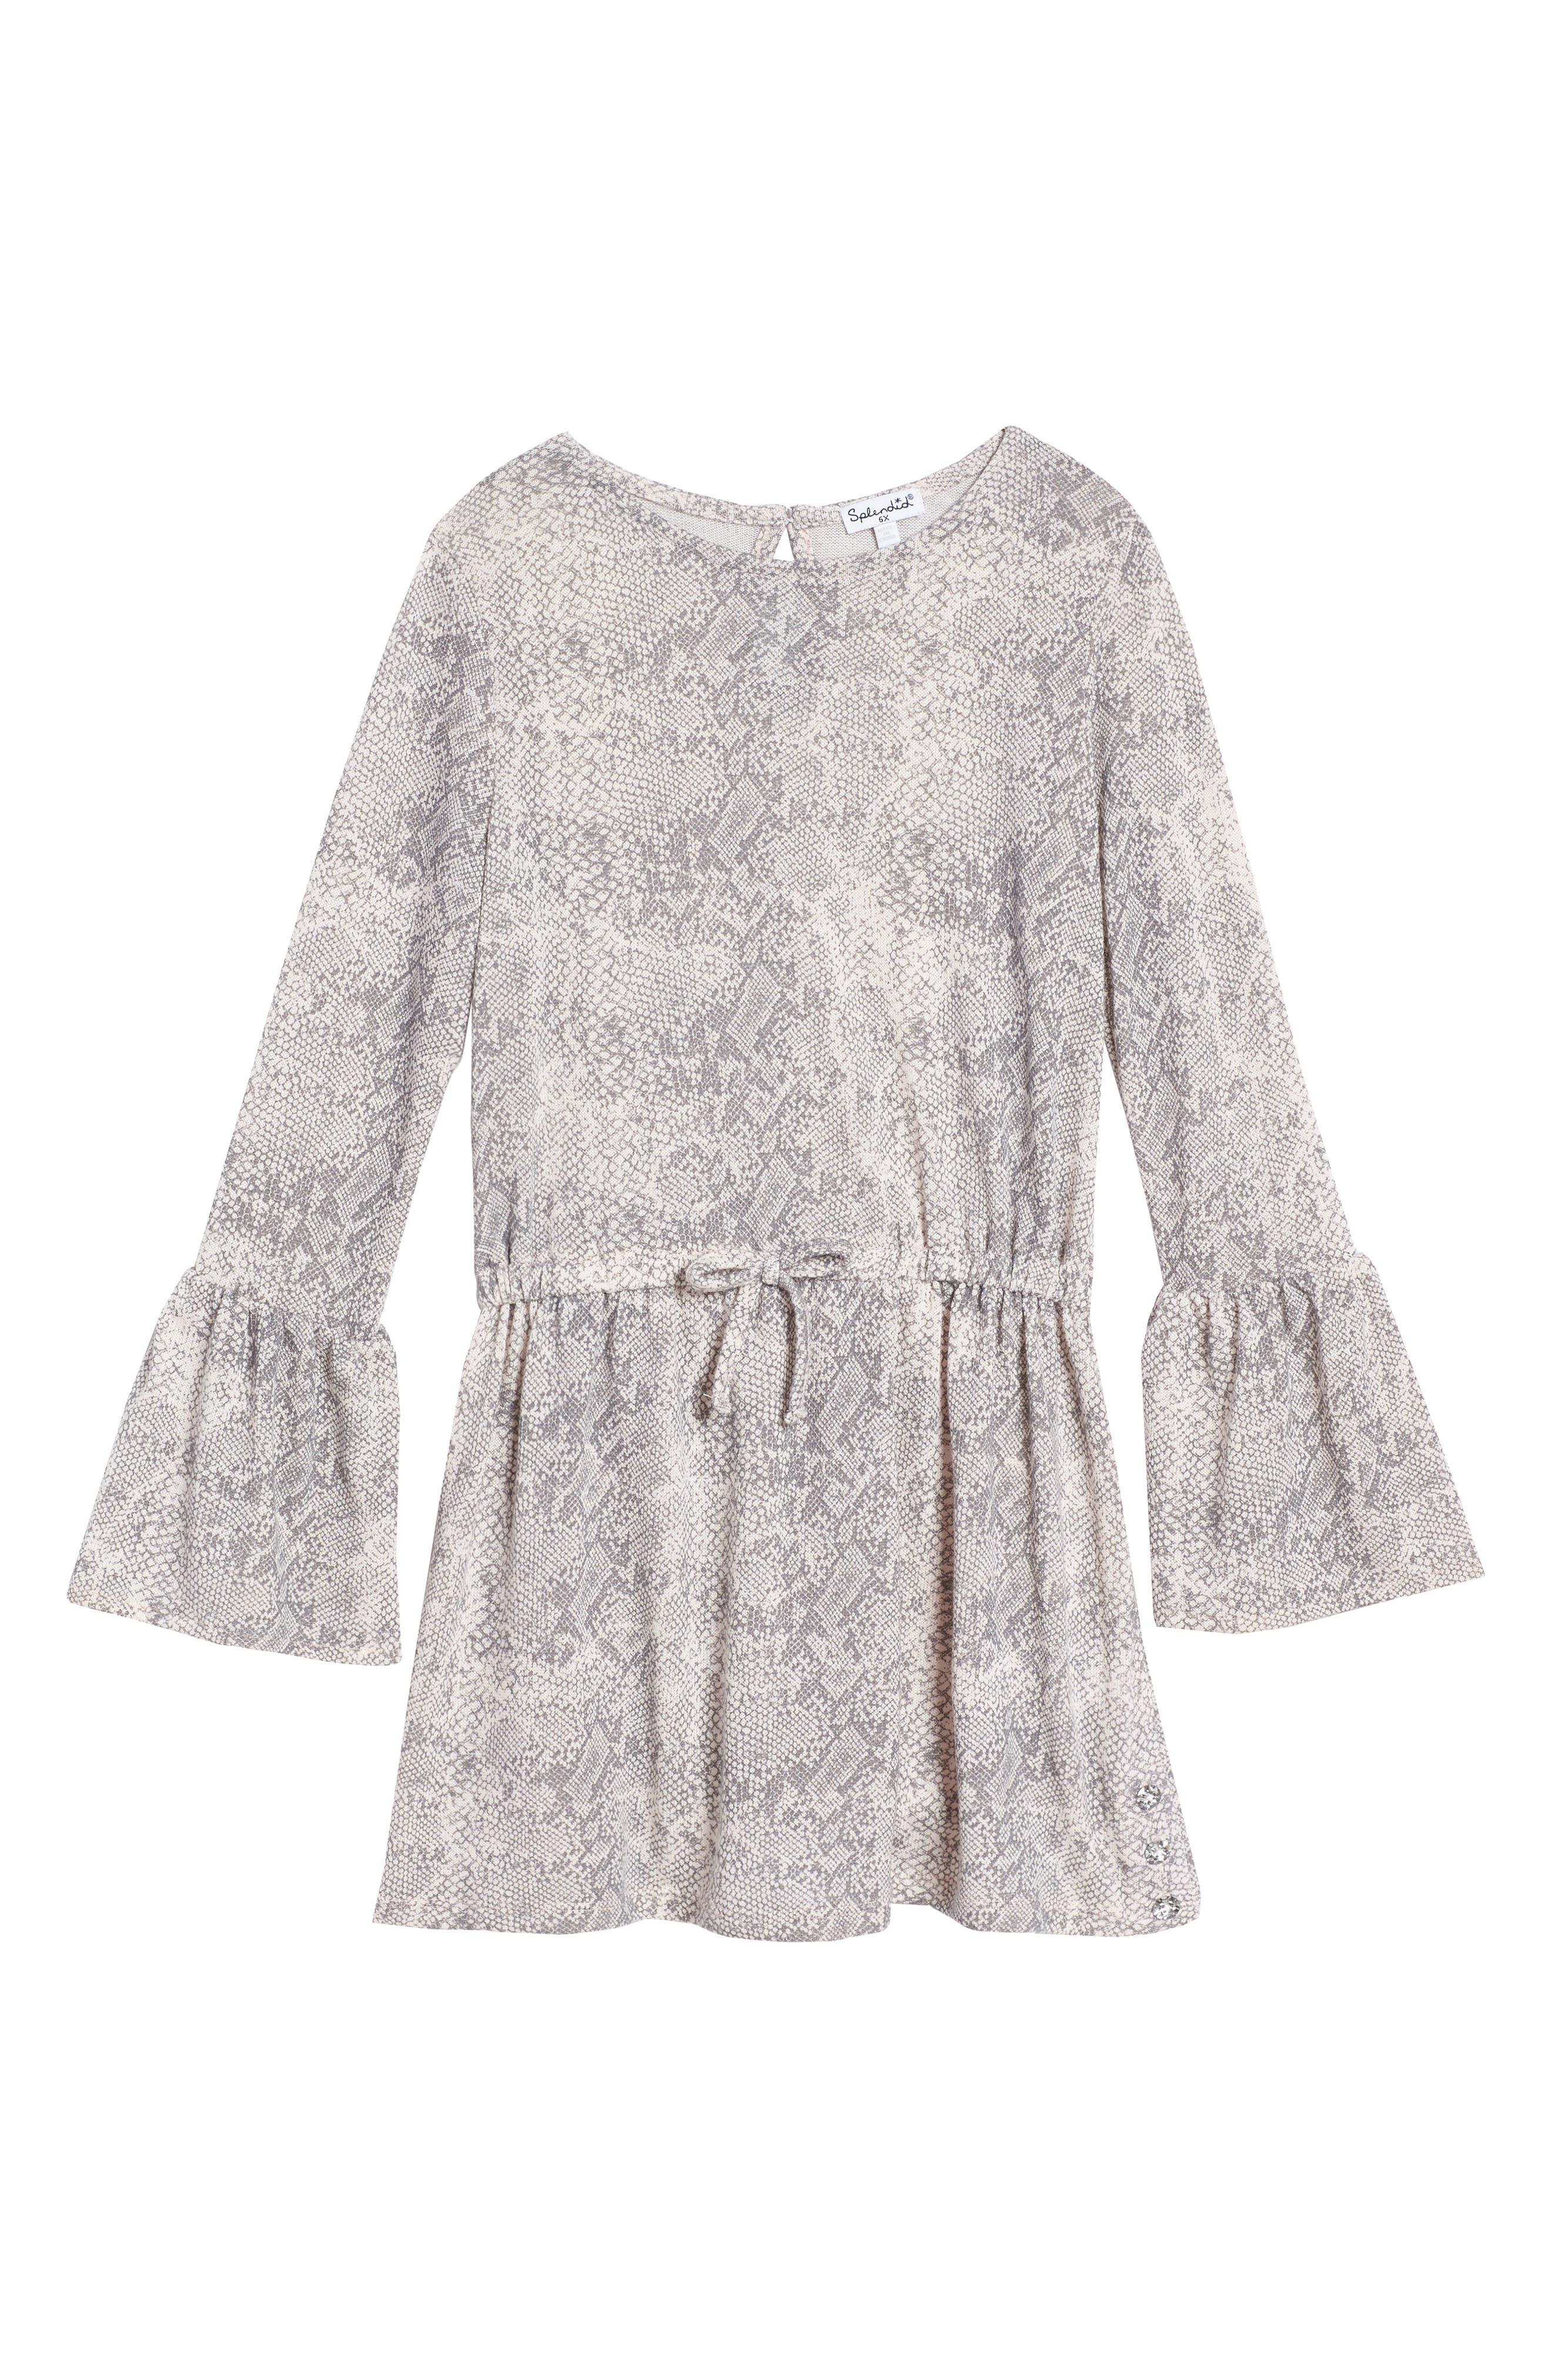 Alternate Image 1 Selected - Splendid Python Print Loose Knit Dress (Big Girls)